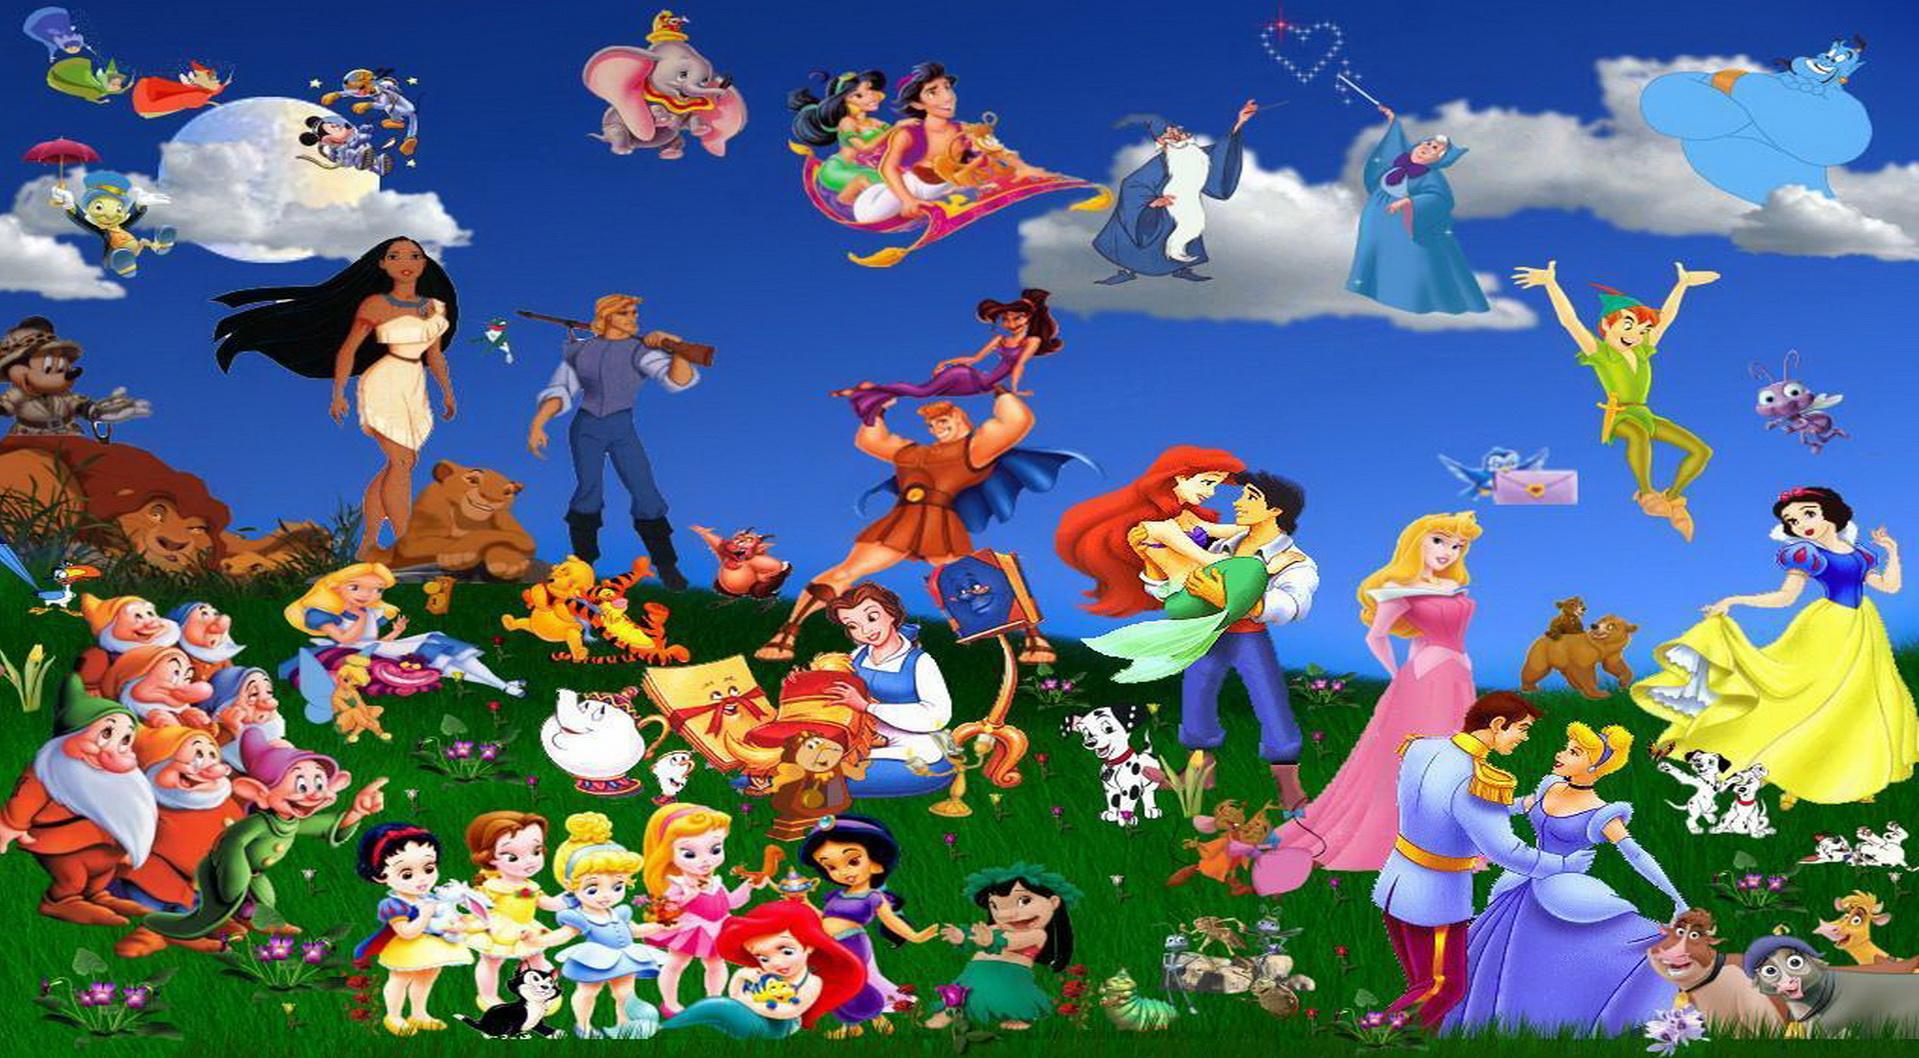 Walt Disney Animation Cartoon Wallpaper 10680 Wallpaper 1919x1058